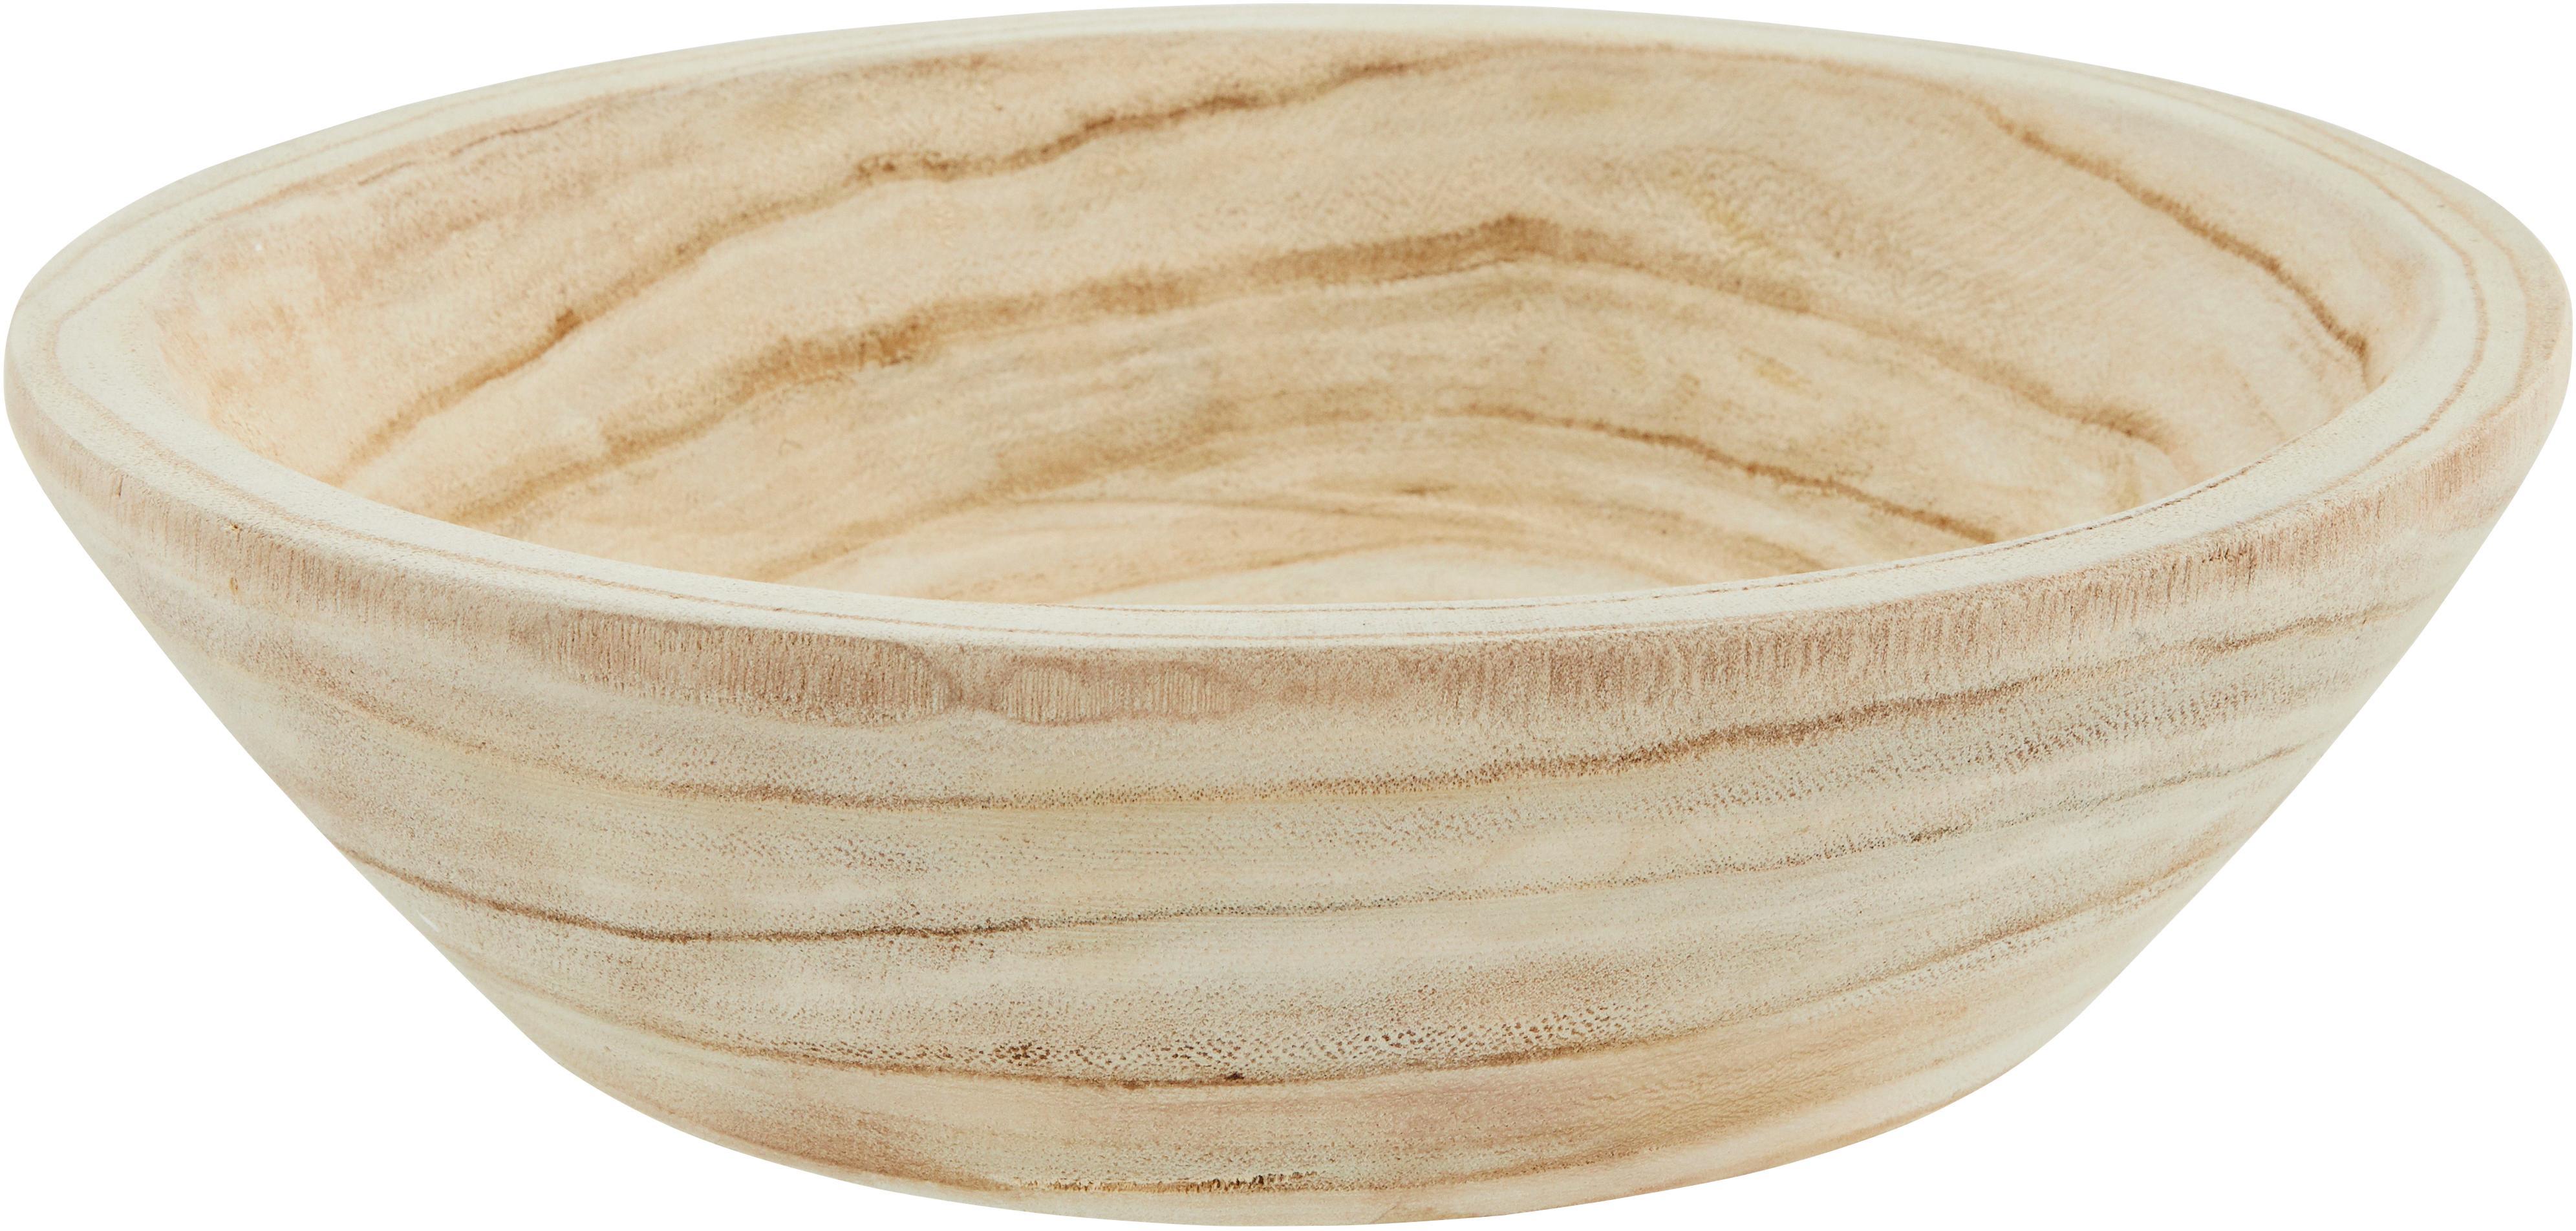 Bol de madera de paulownia Sandry, Madera de Paulownia aceitada, Natural, Ø 29 x Al 8 cm